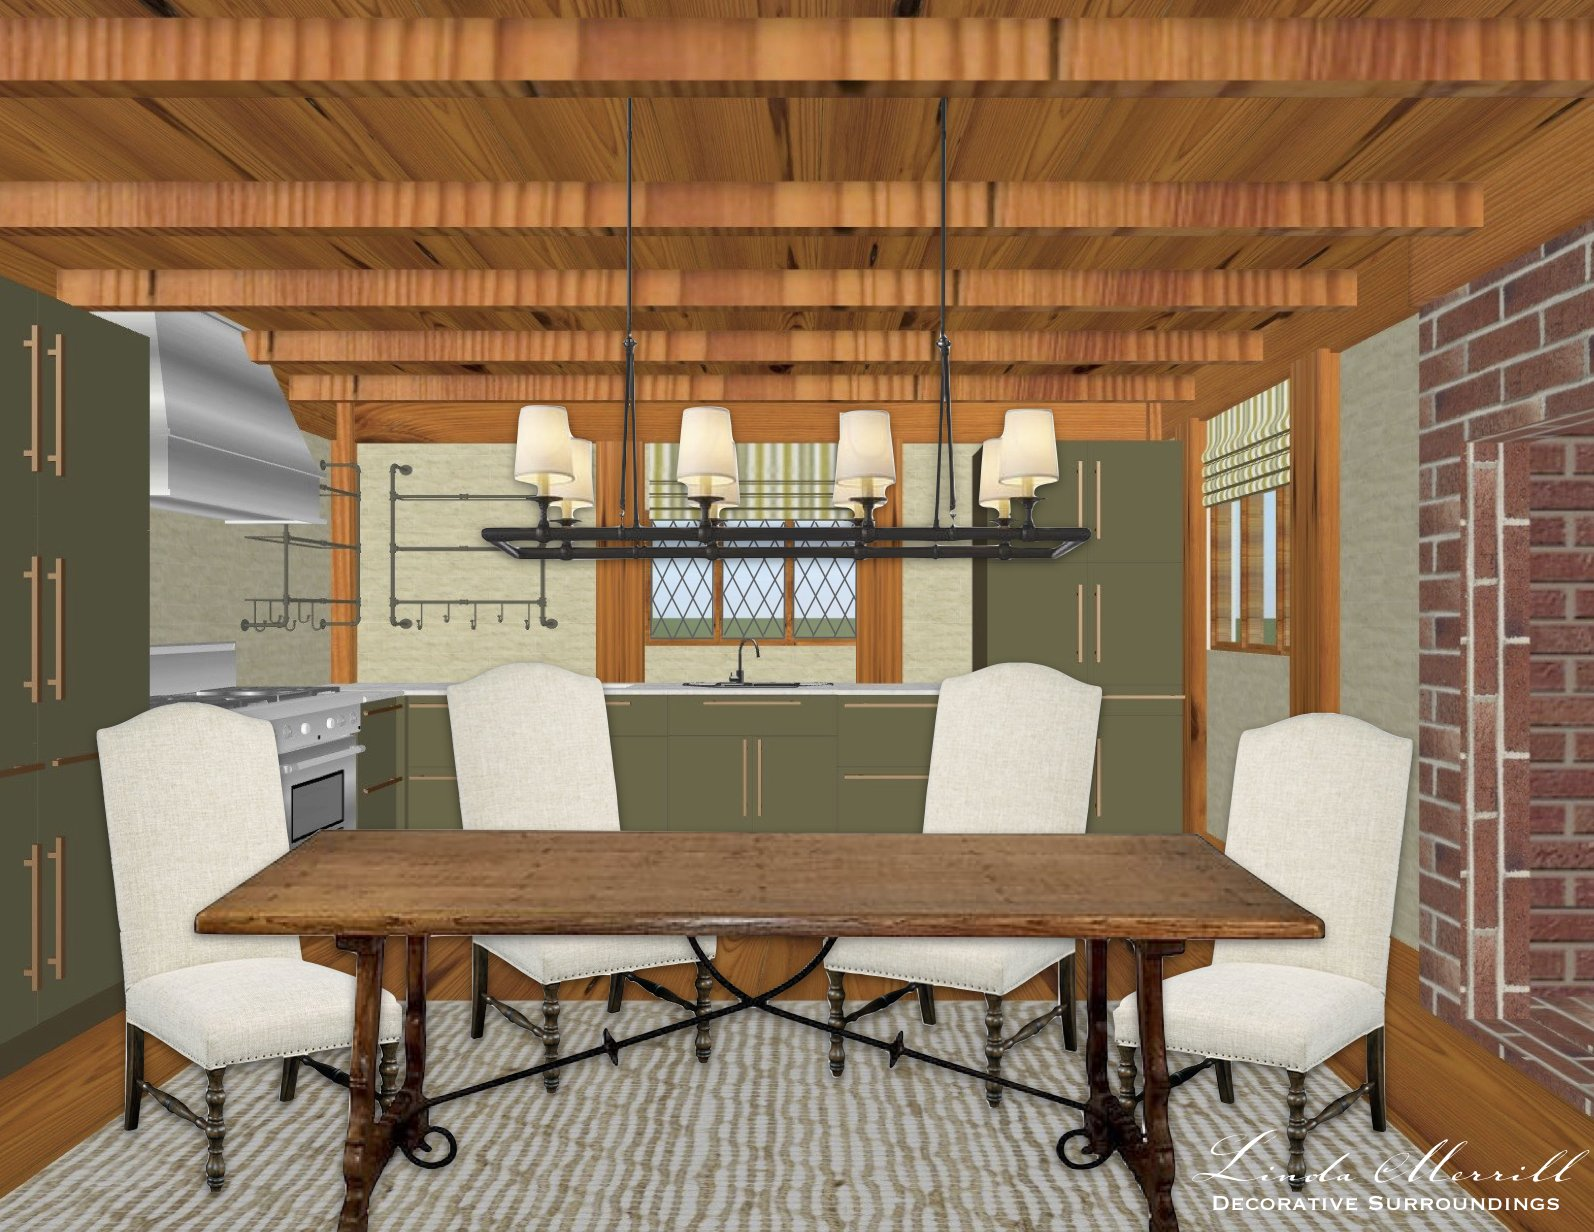 Linda Merrill Modern Living in Antique Houses Kitchen Decorating